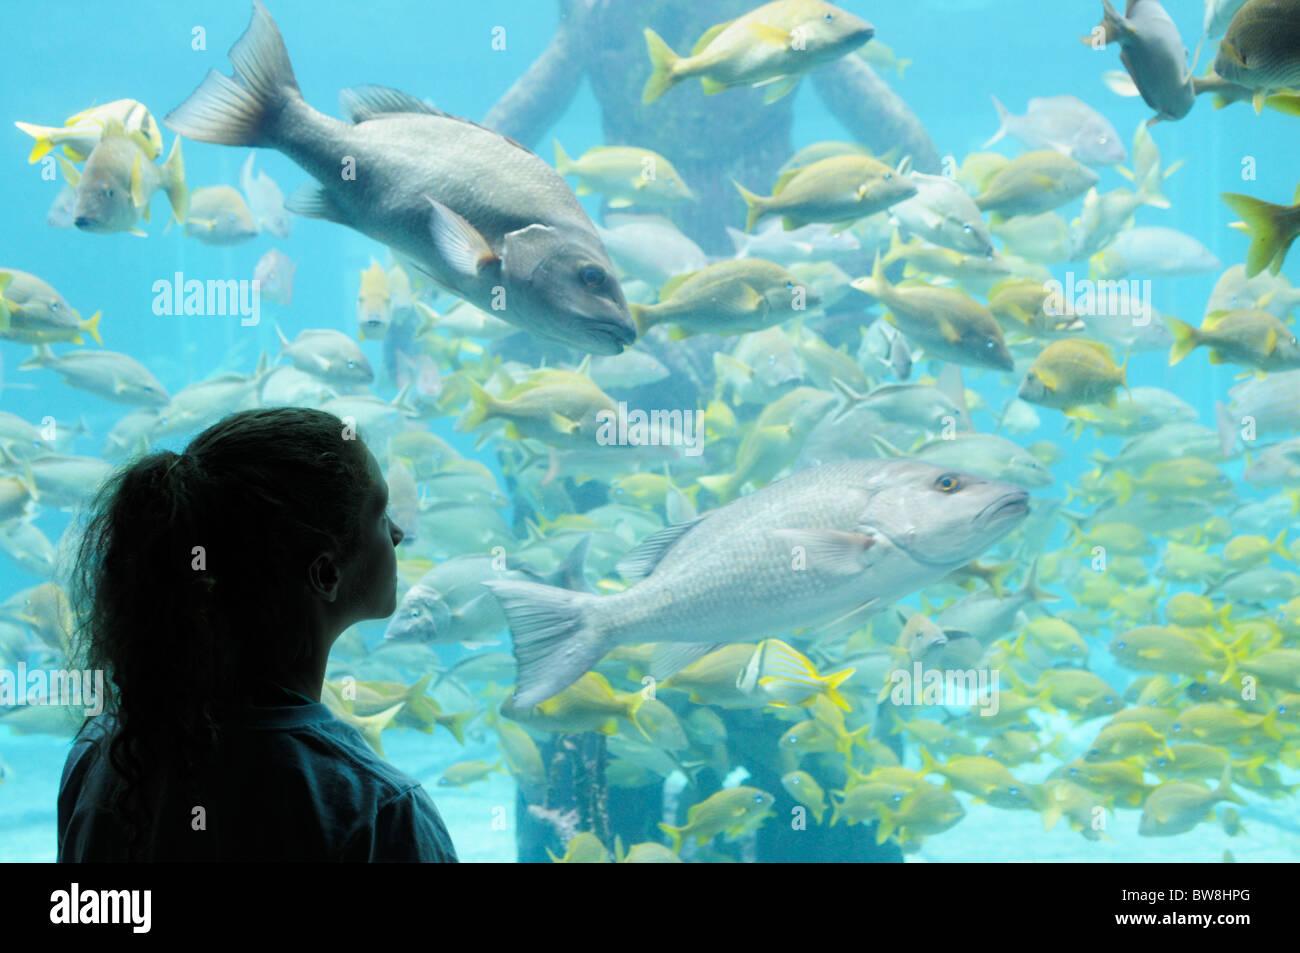 Girl watching fish in one of the many large aquarium tanks at the Atlantis resort, The Bahamas - Stock Image